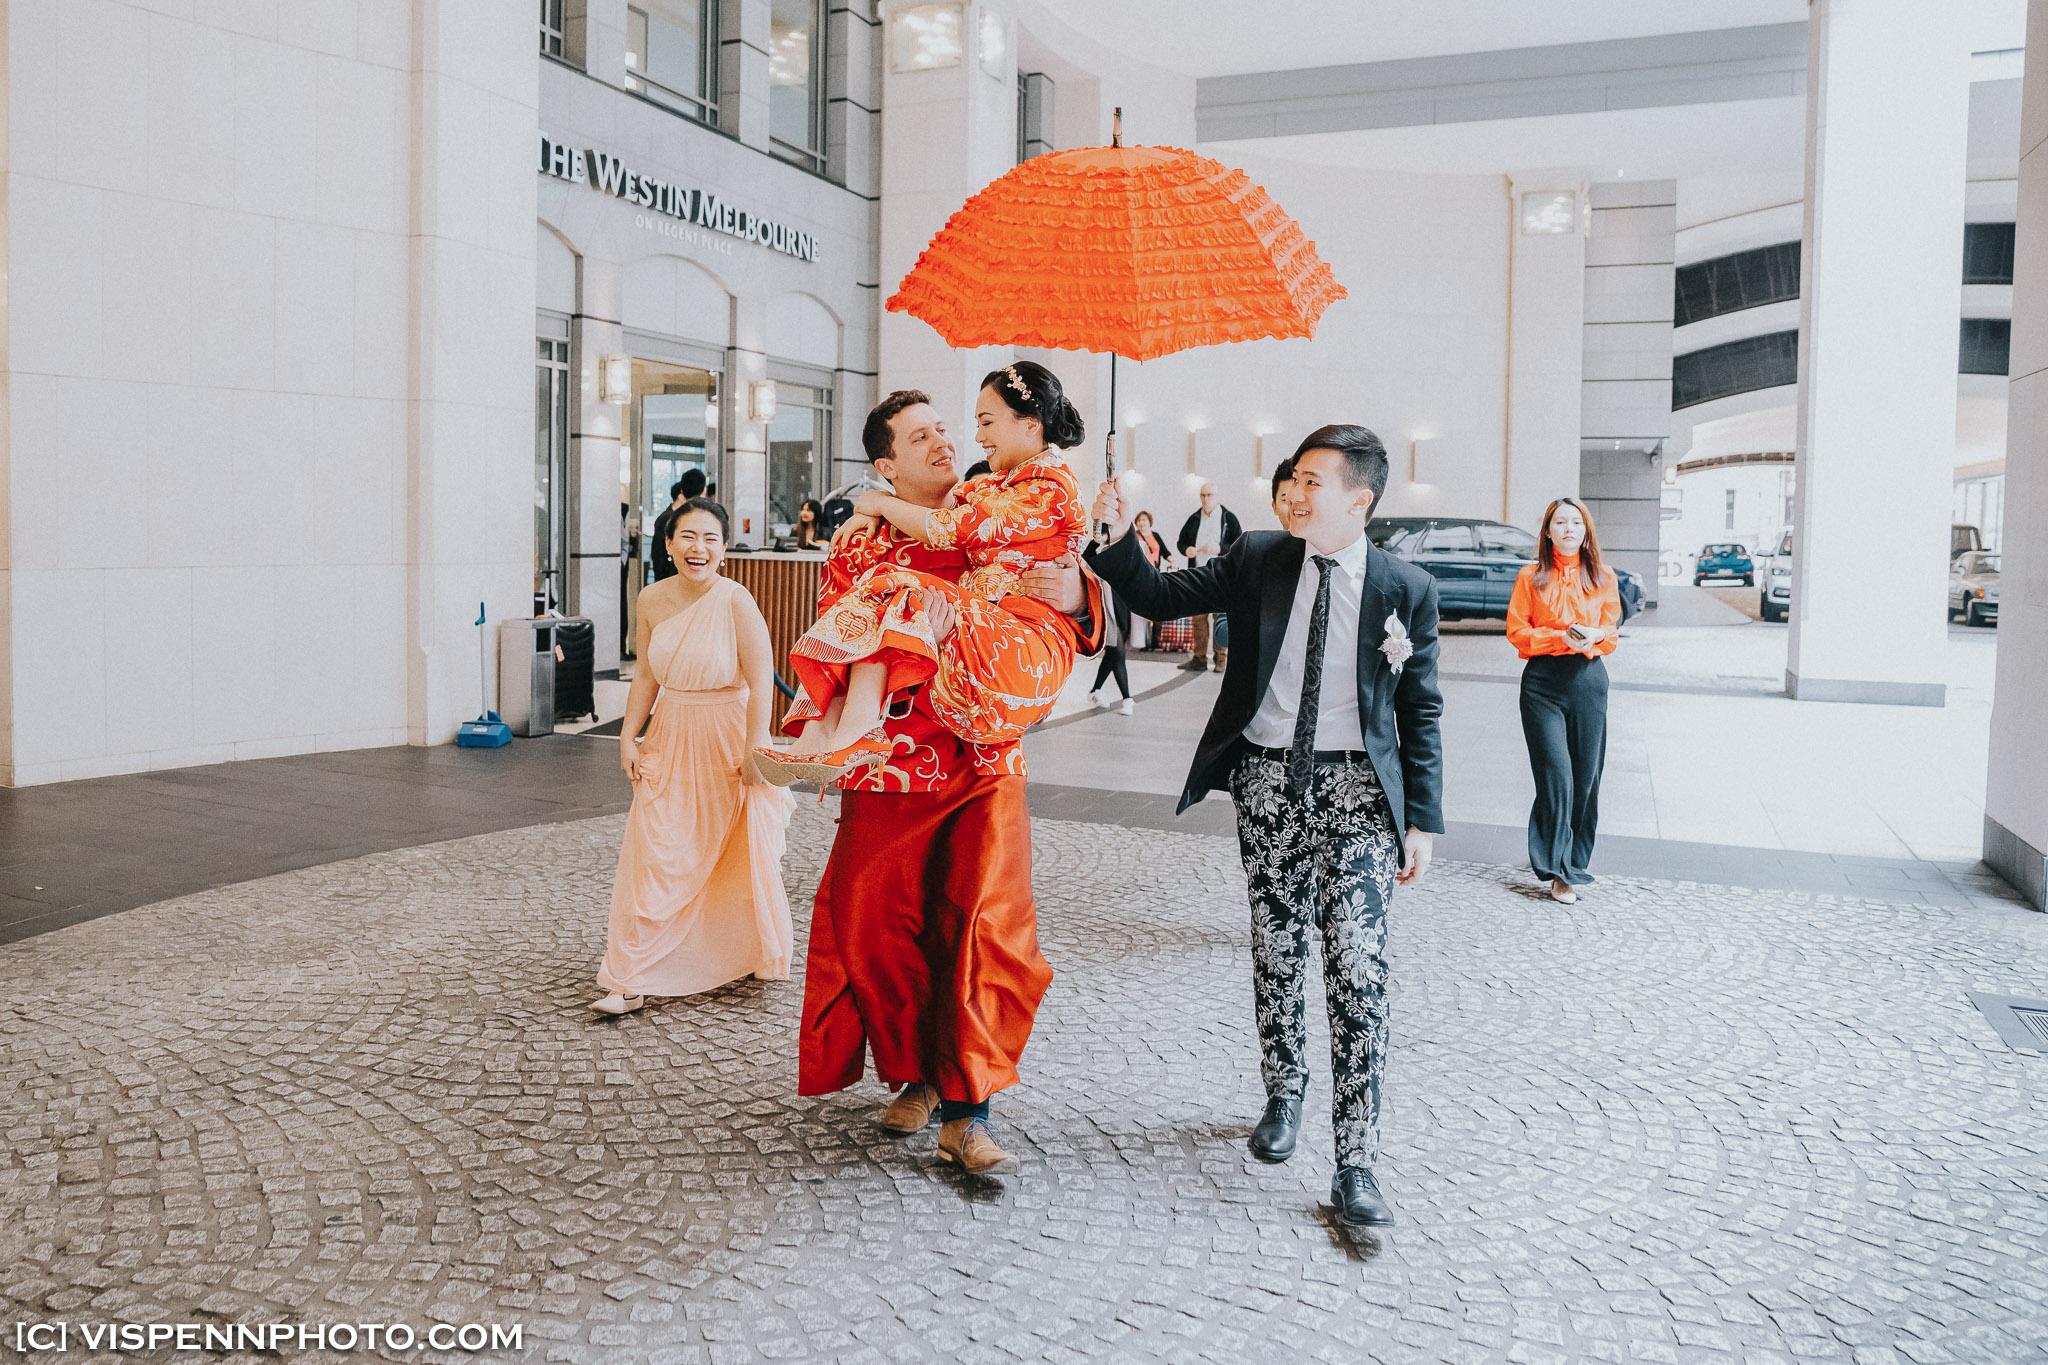 WEDDING DAY Photography Melbourne VISPENN 墨尔本 婚礼跟拍 婚礼摄像 婚礼摄影 结婚照 登记照 VISPENN Kat P1 02964